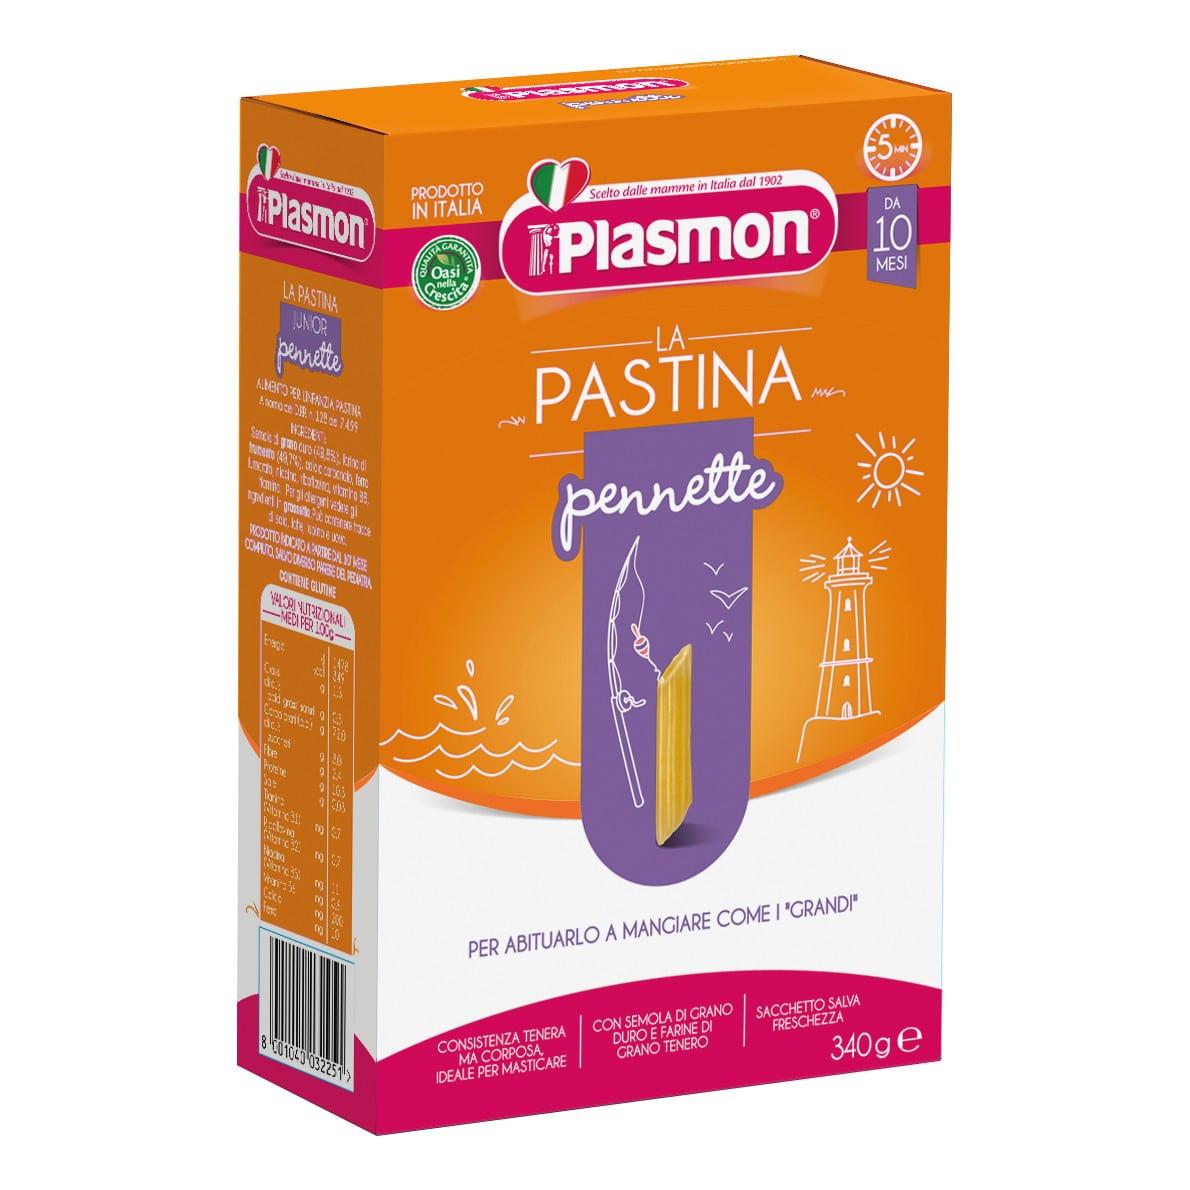 Pastina Pennette Plasmon